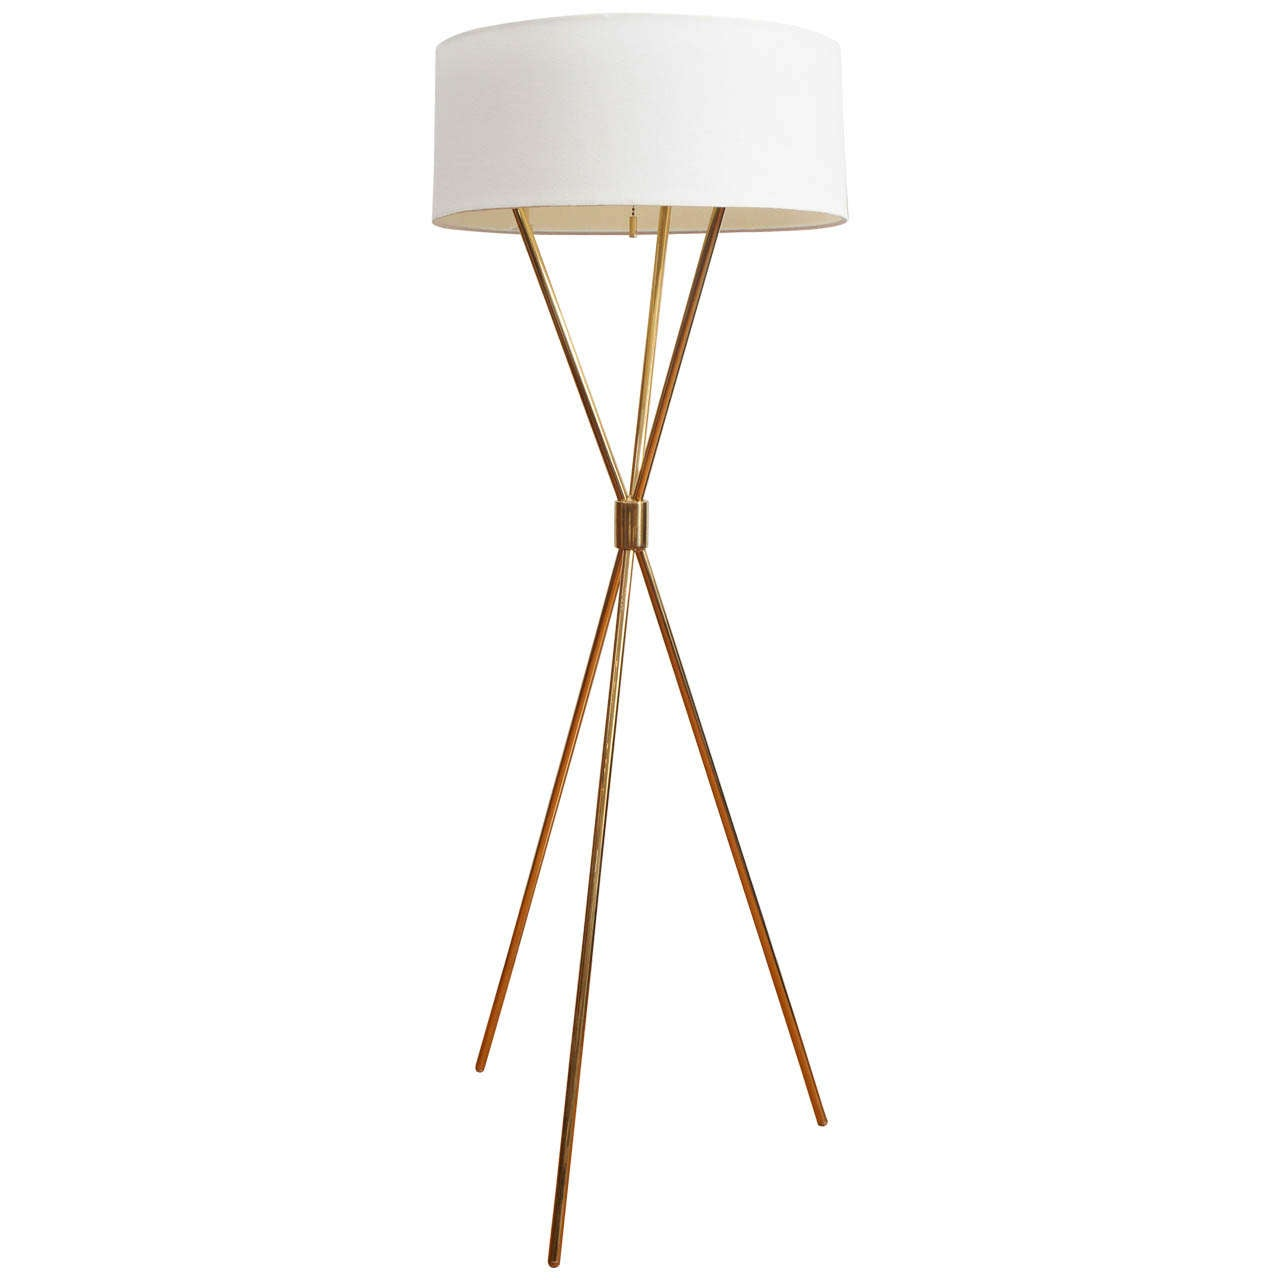 Hinson Brass Tripod Floor Lamp At 1stdibs